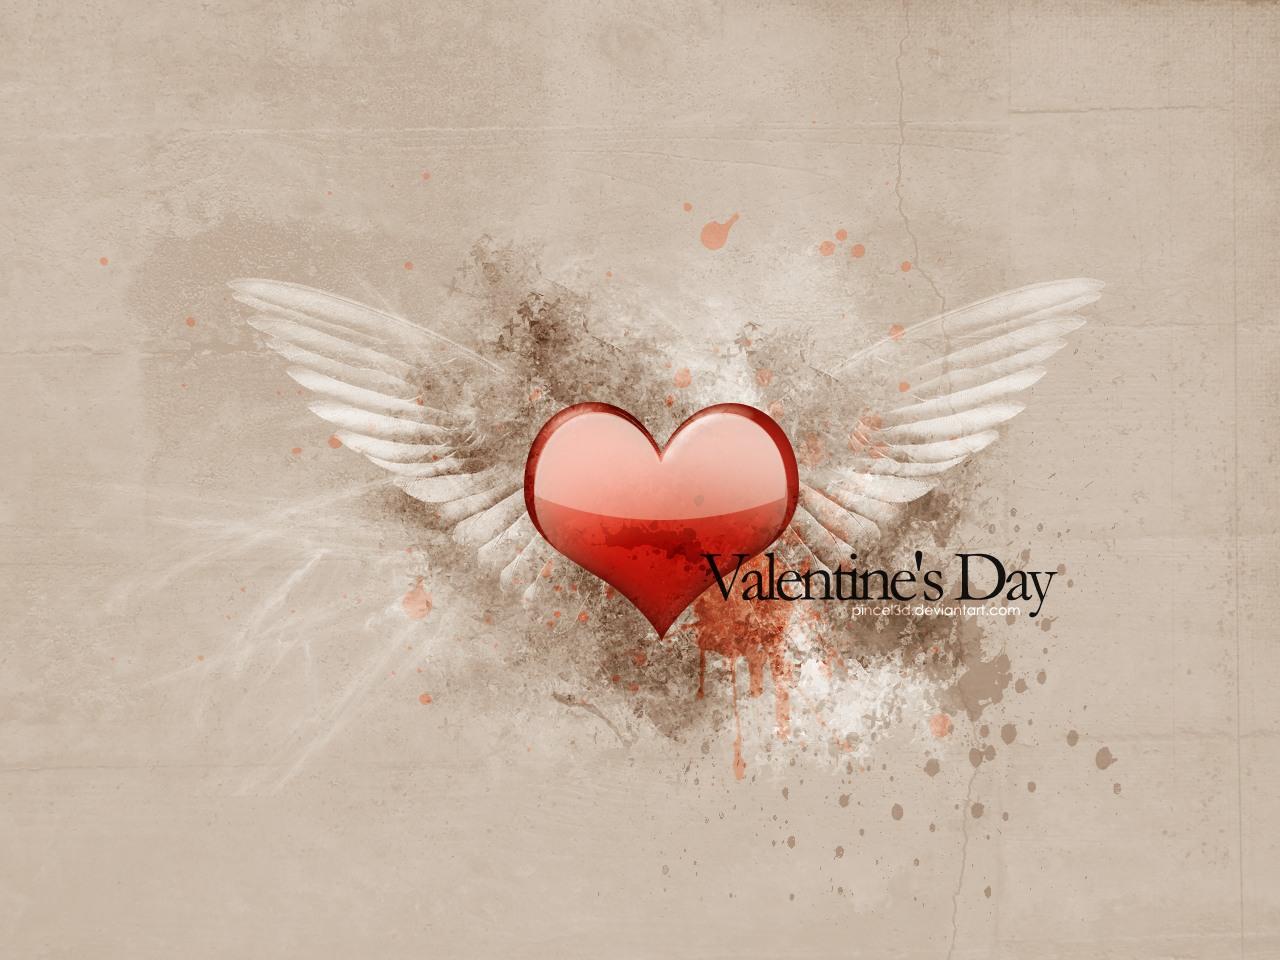 valentines day wallpaper 01 valentines day wallpaper 02 valentines day 1280x960